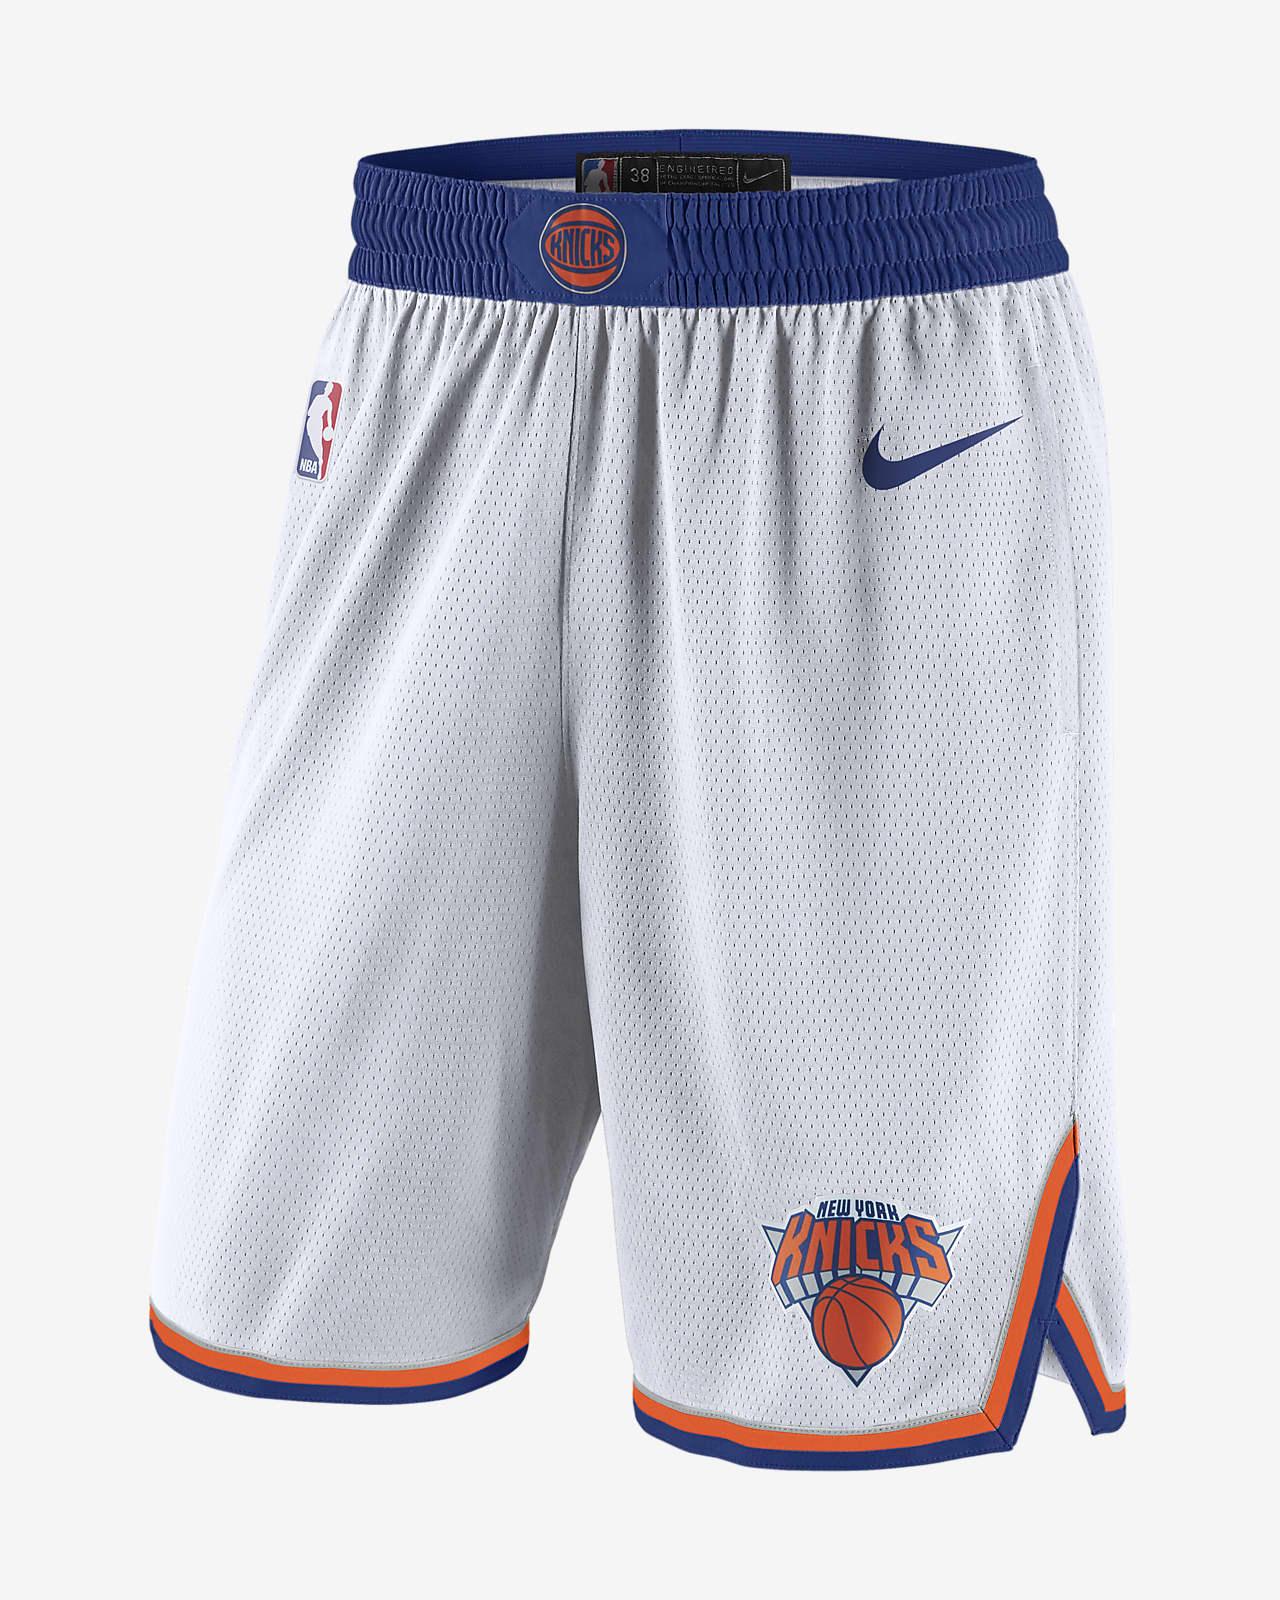 New York Knicks Men's Nike NBA Swingman Shorts